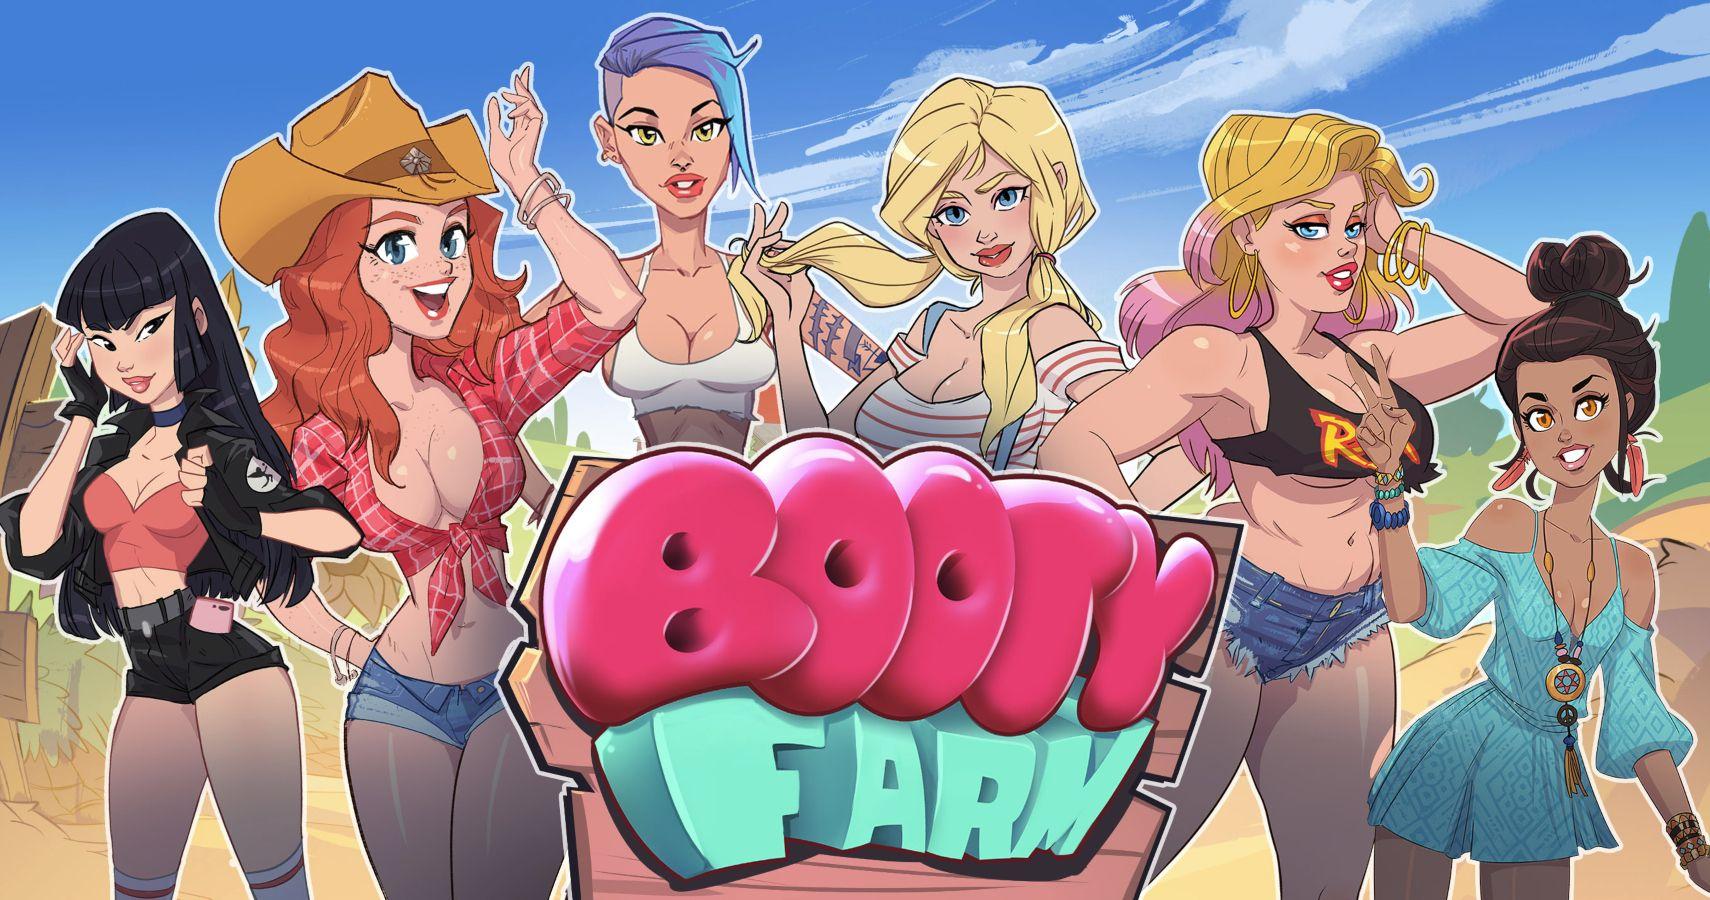 Booty Farm Pic